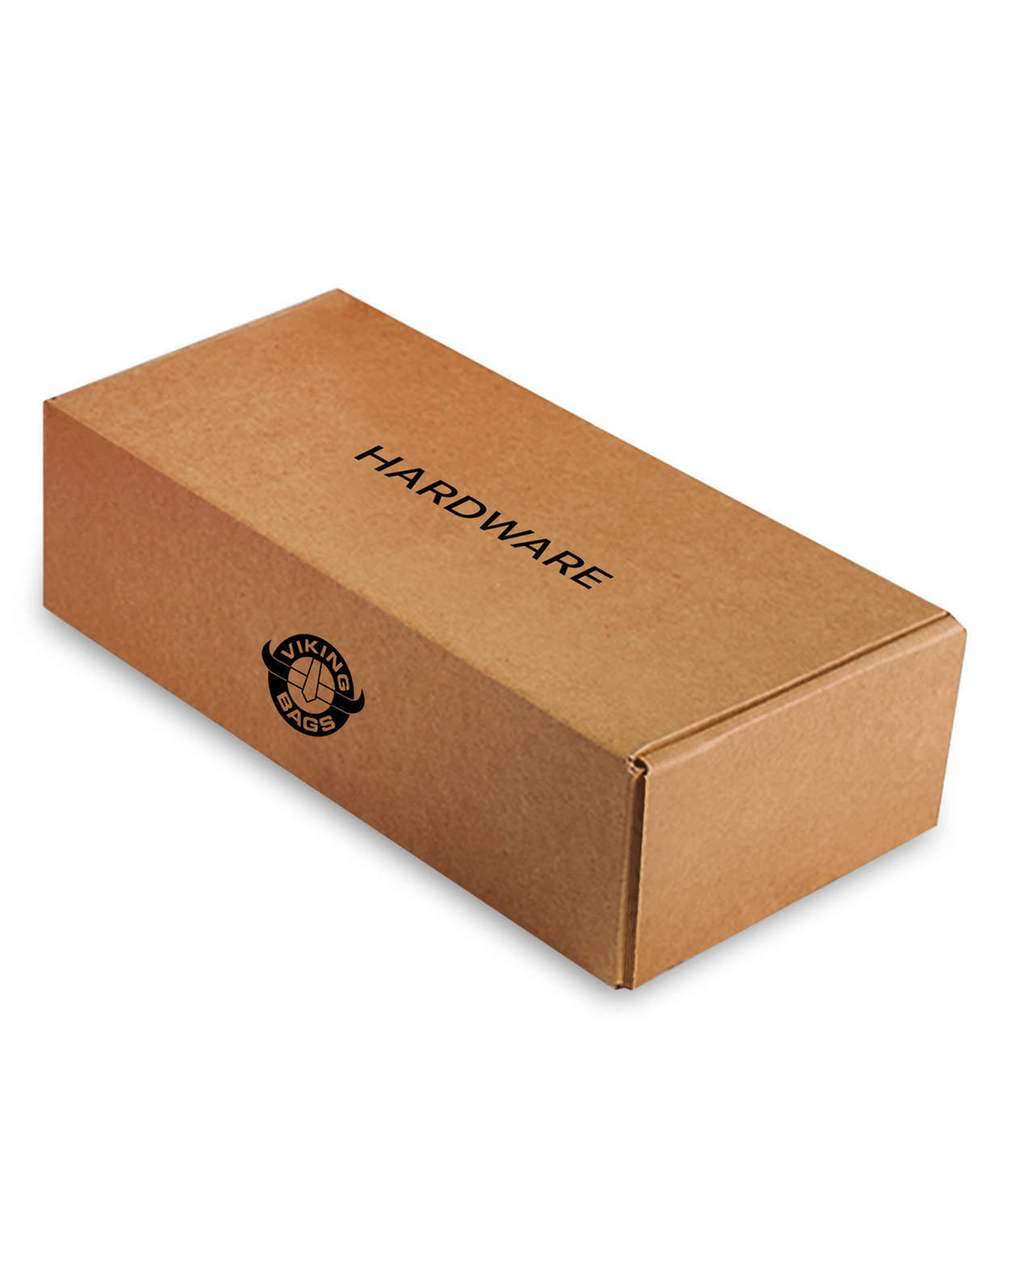 Indian Scout Sixty Medium Charger Single Strap Motorcycle Saddlebags Hardware Box